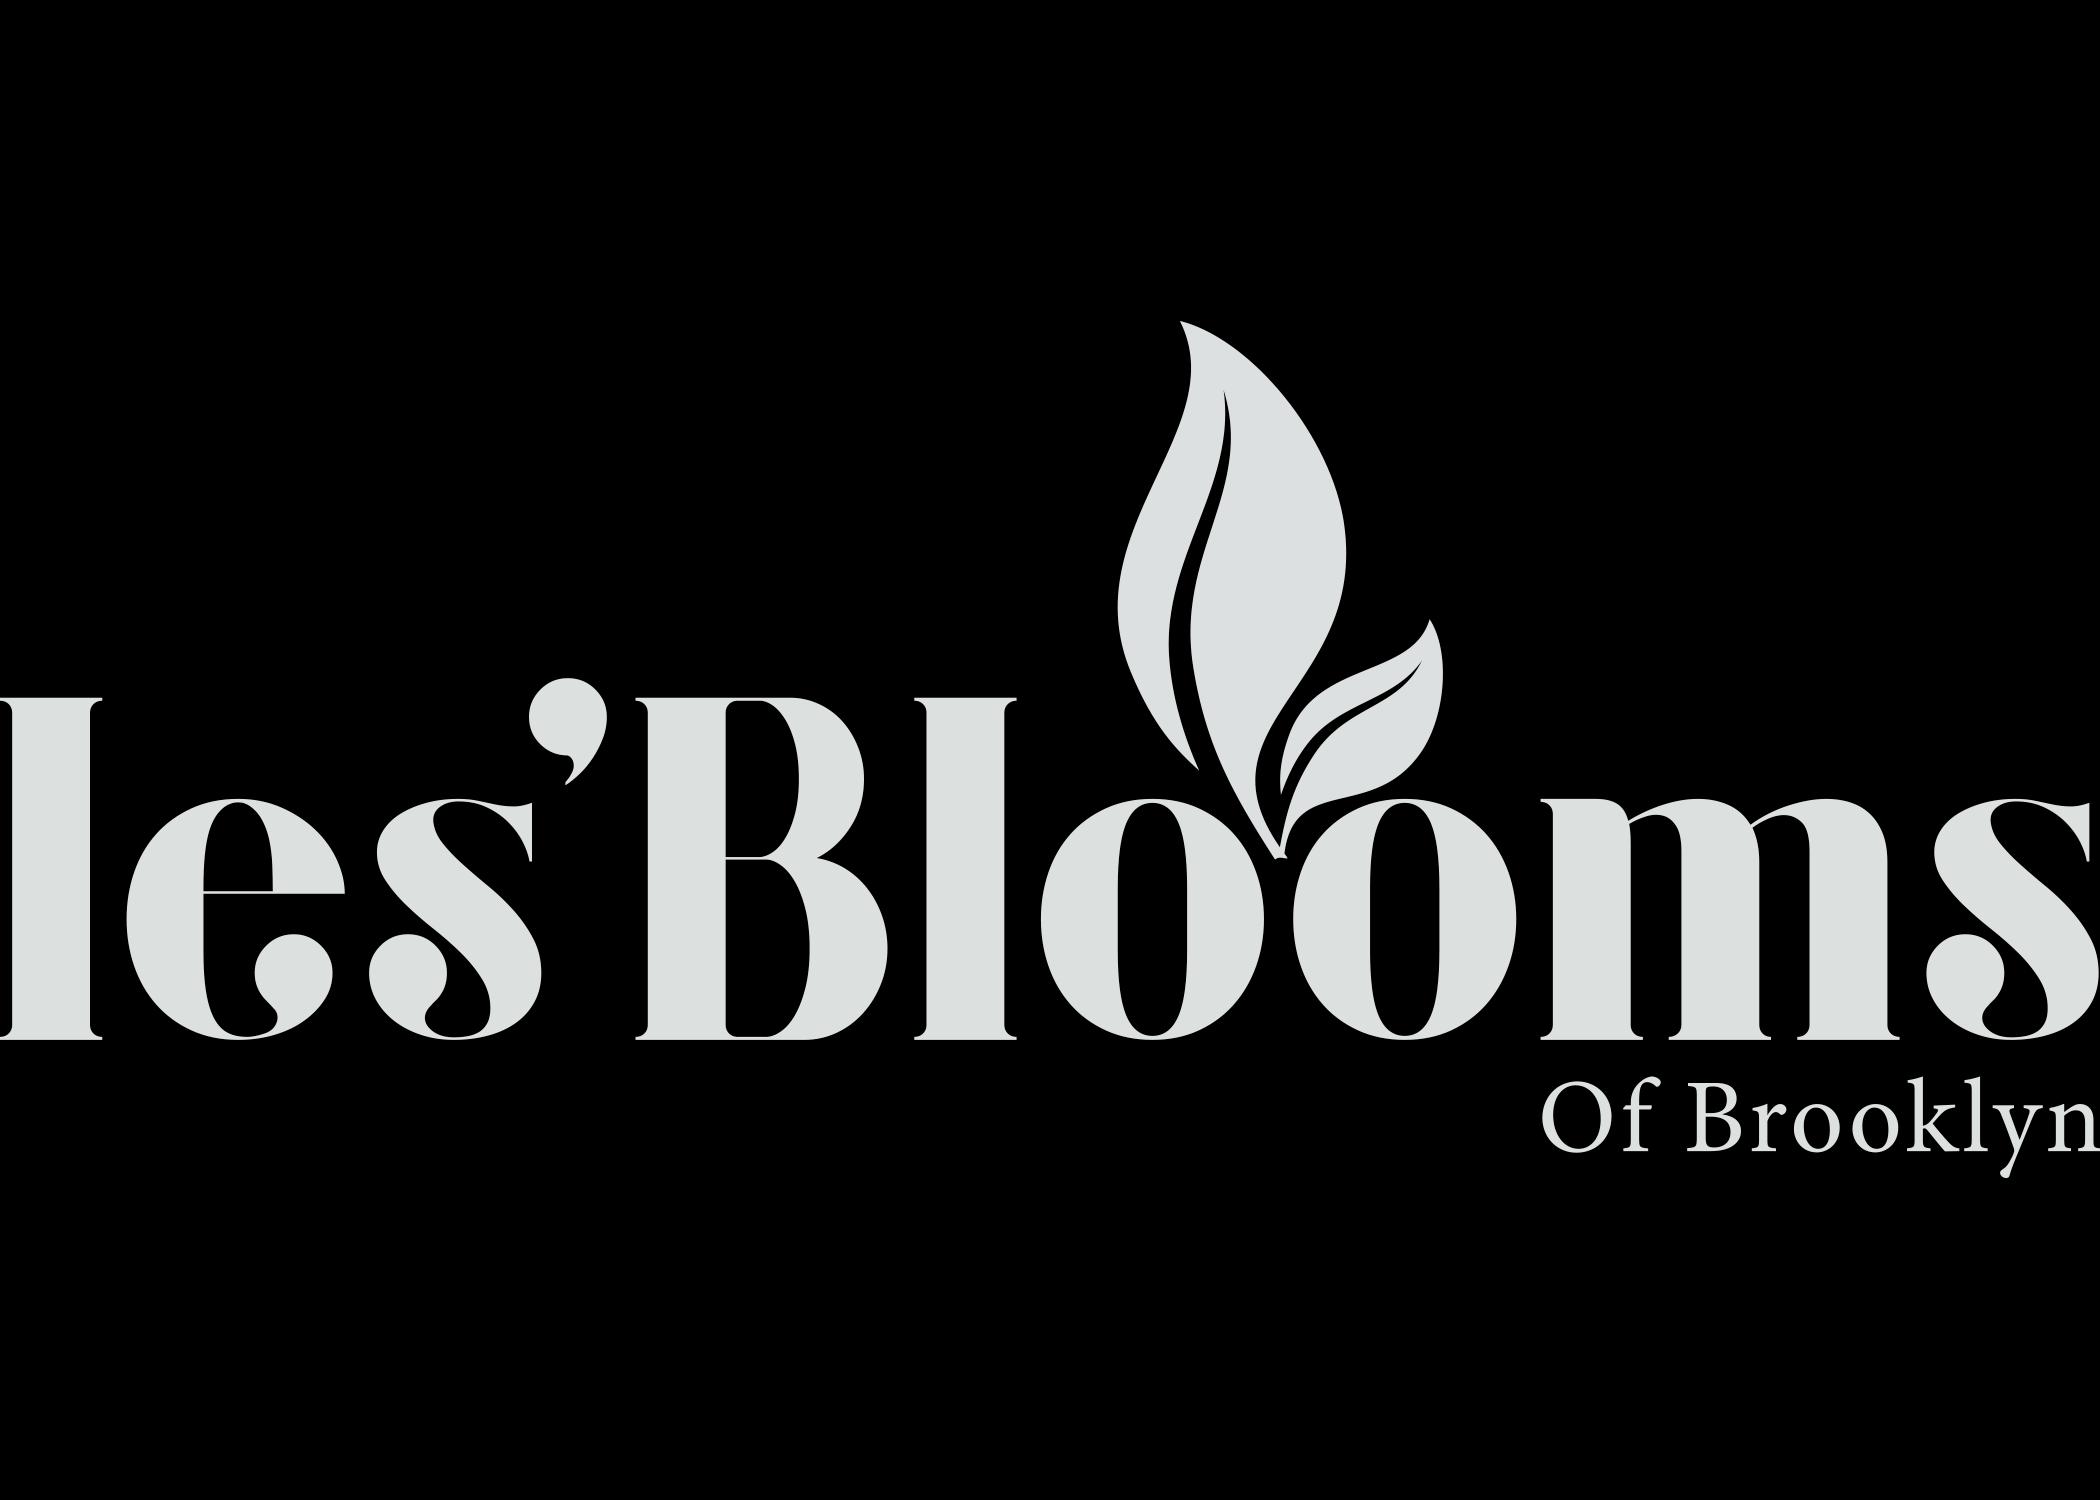 lesblooms_brooklyn_black.jpg